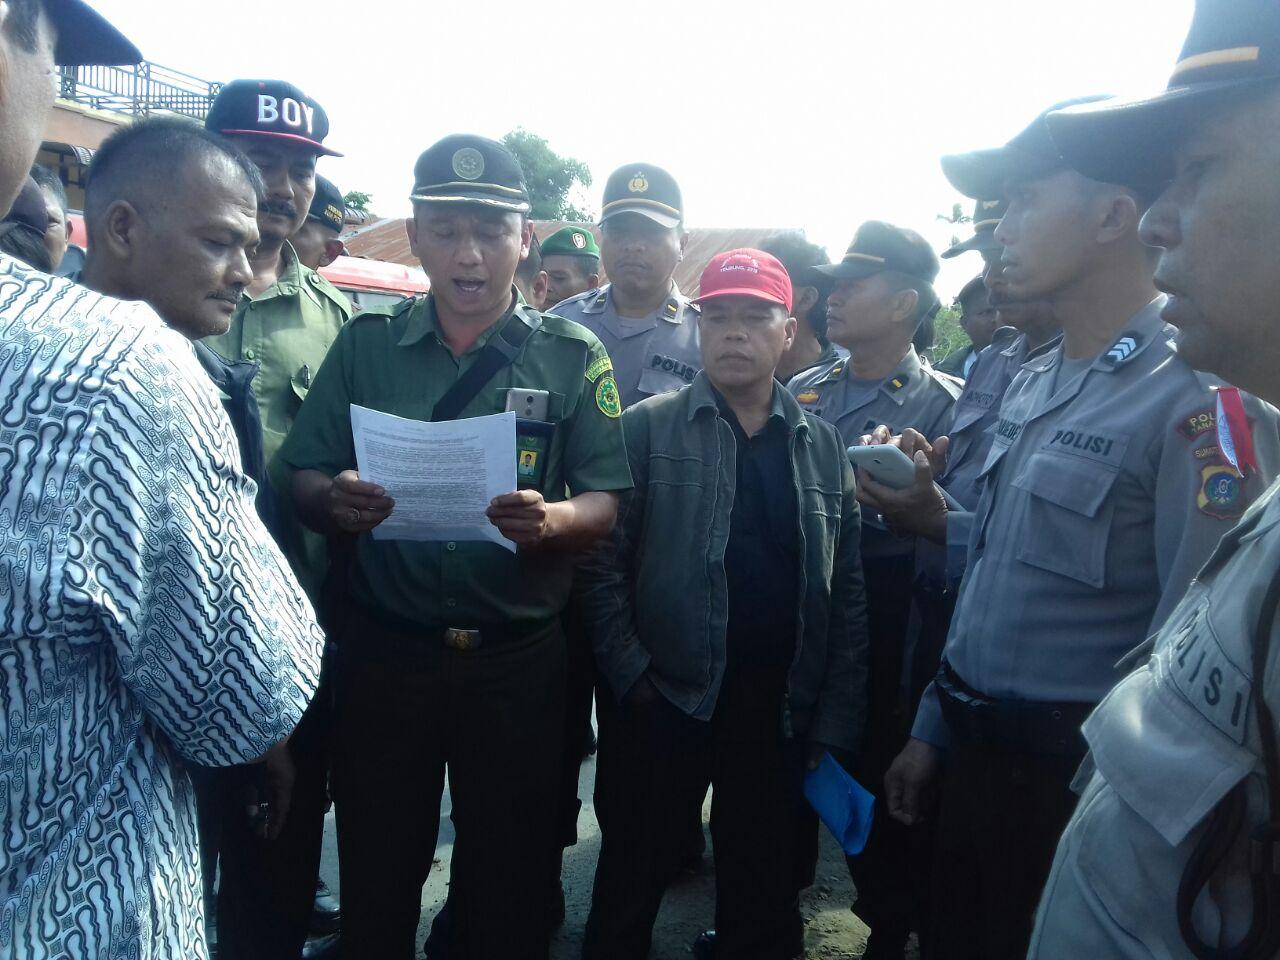 Pnegadilan Negeri Kabanjahe Eksekusi Objek di Desa Tigapanah